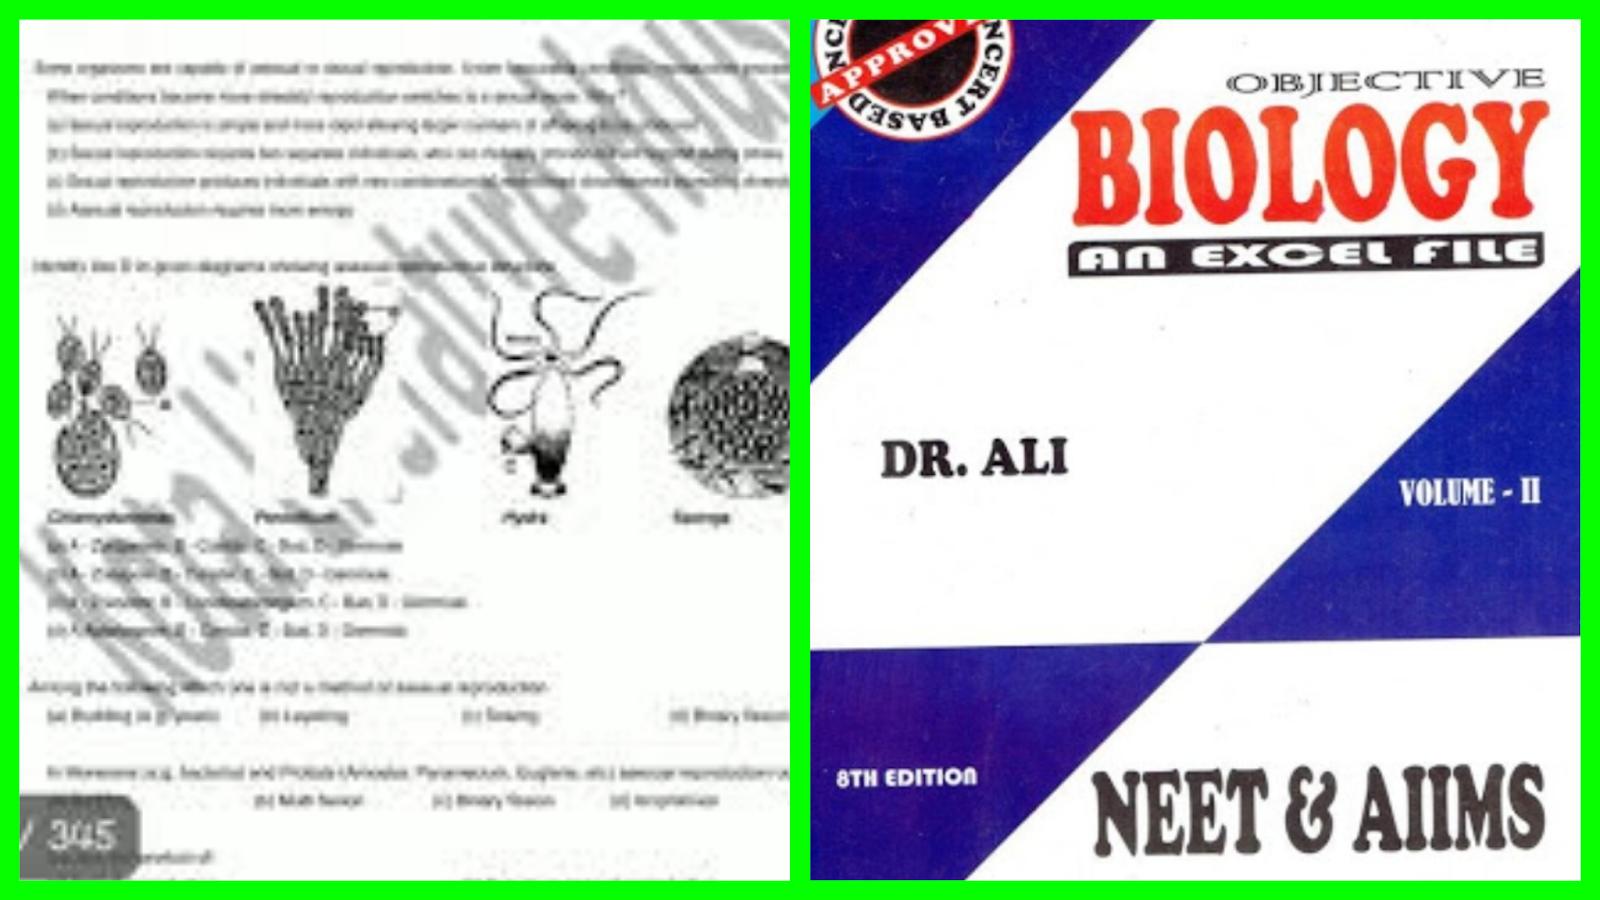 Objective Biology Pdf Dr Ali